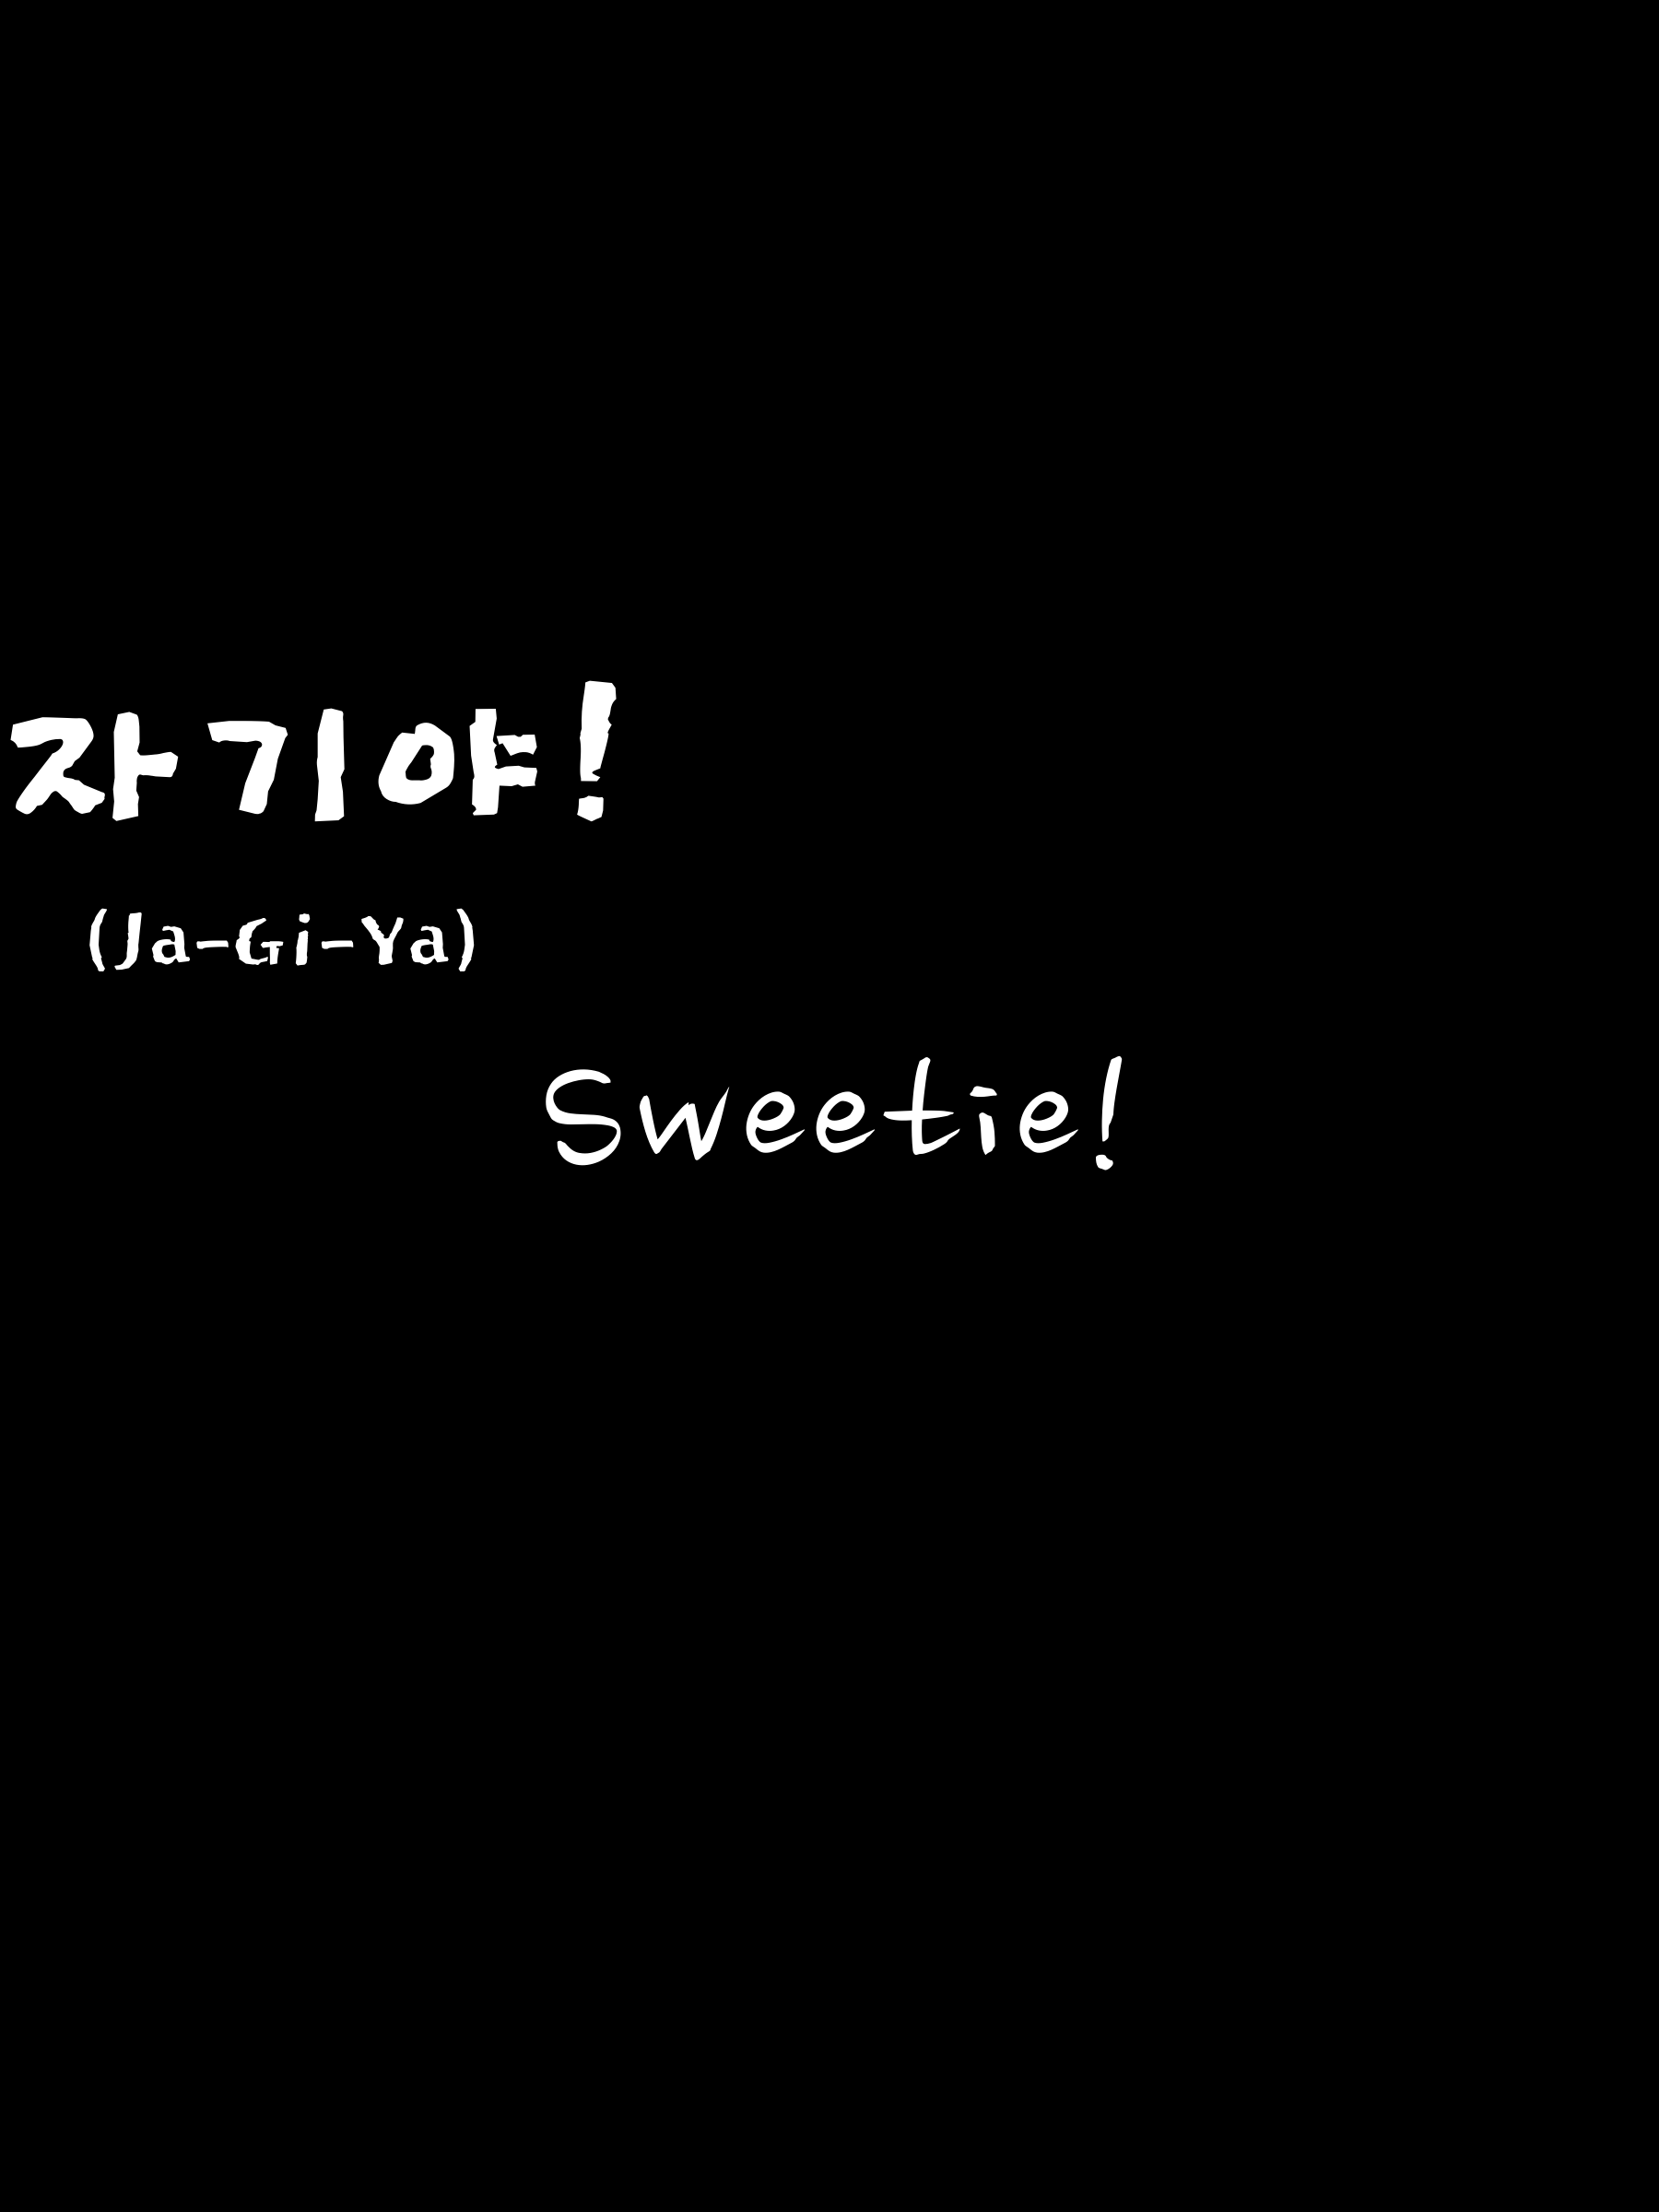 Learning Korean Aestheticnotes